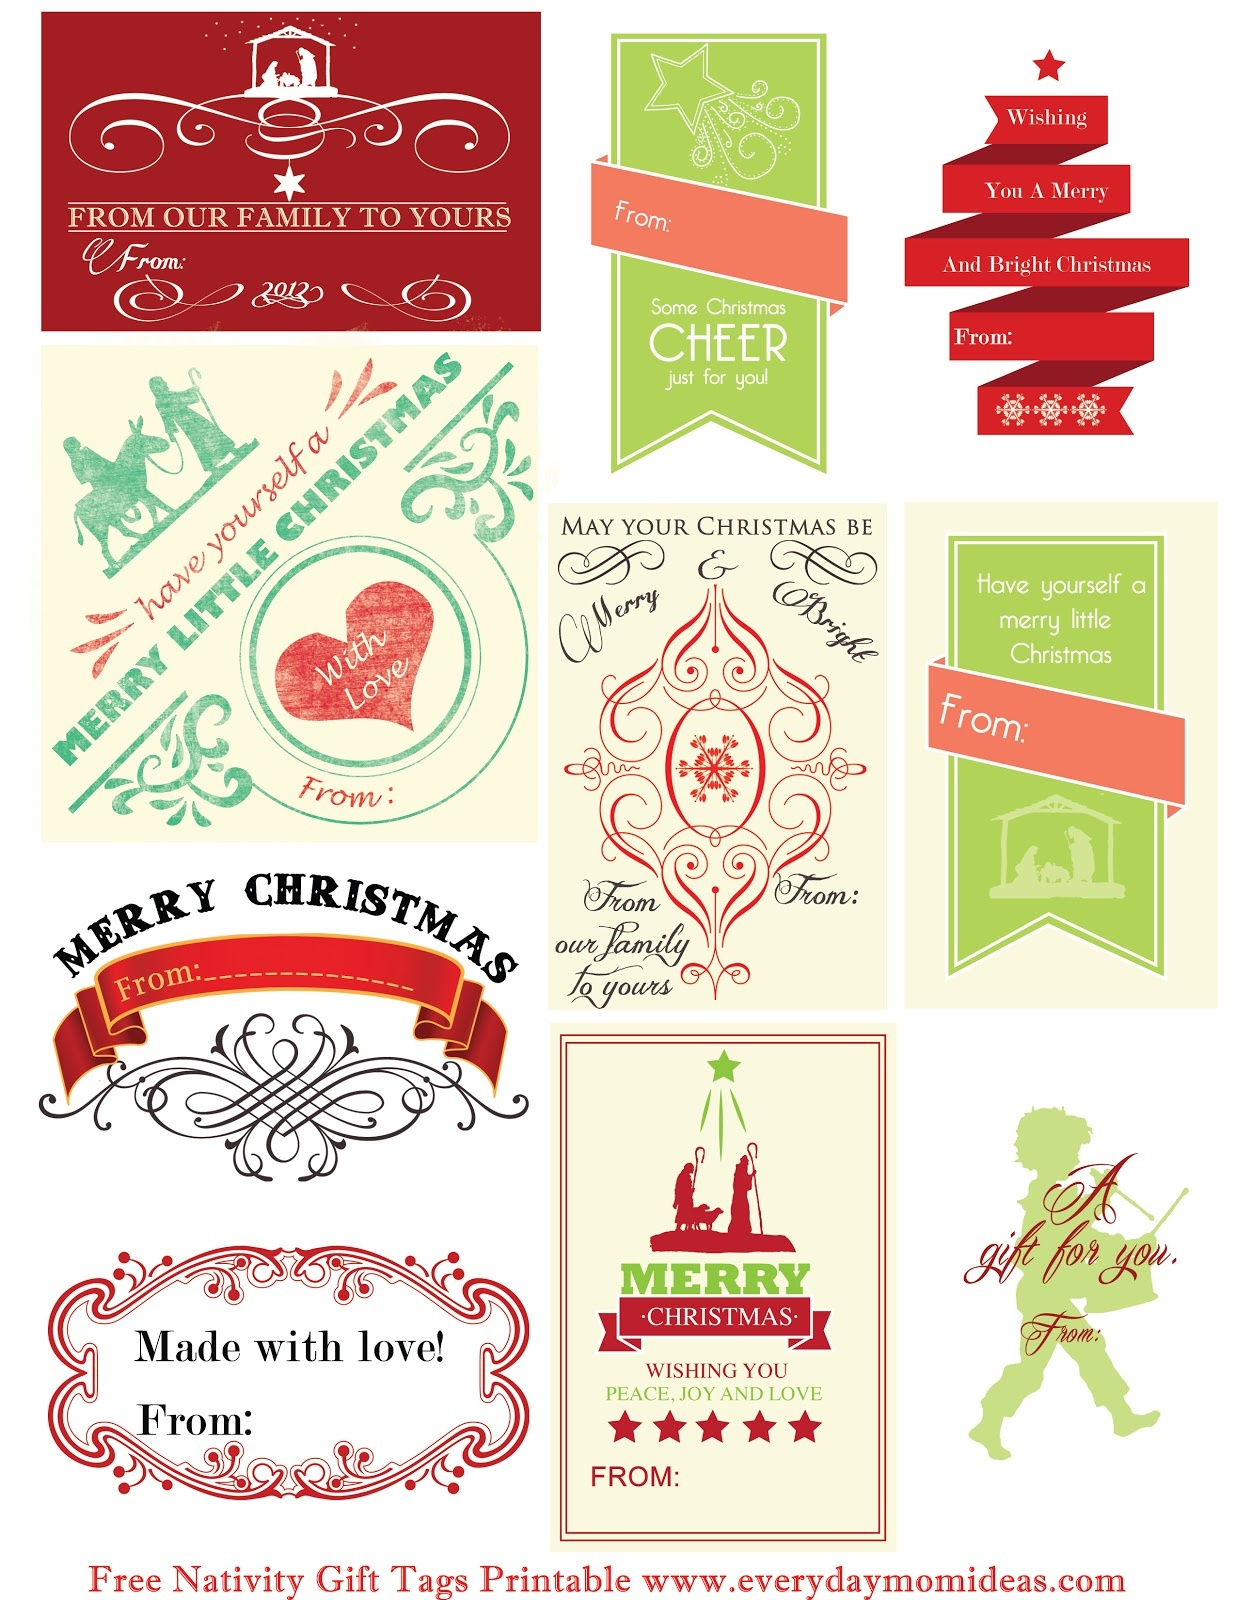 Free Nativity Gift Tags Printable - Everyday Mom Ideas - Free Printable Christian Christmas Gift Tags